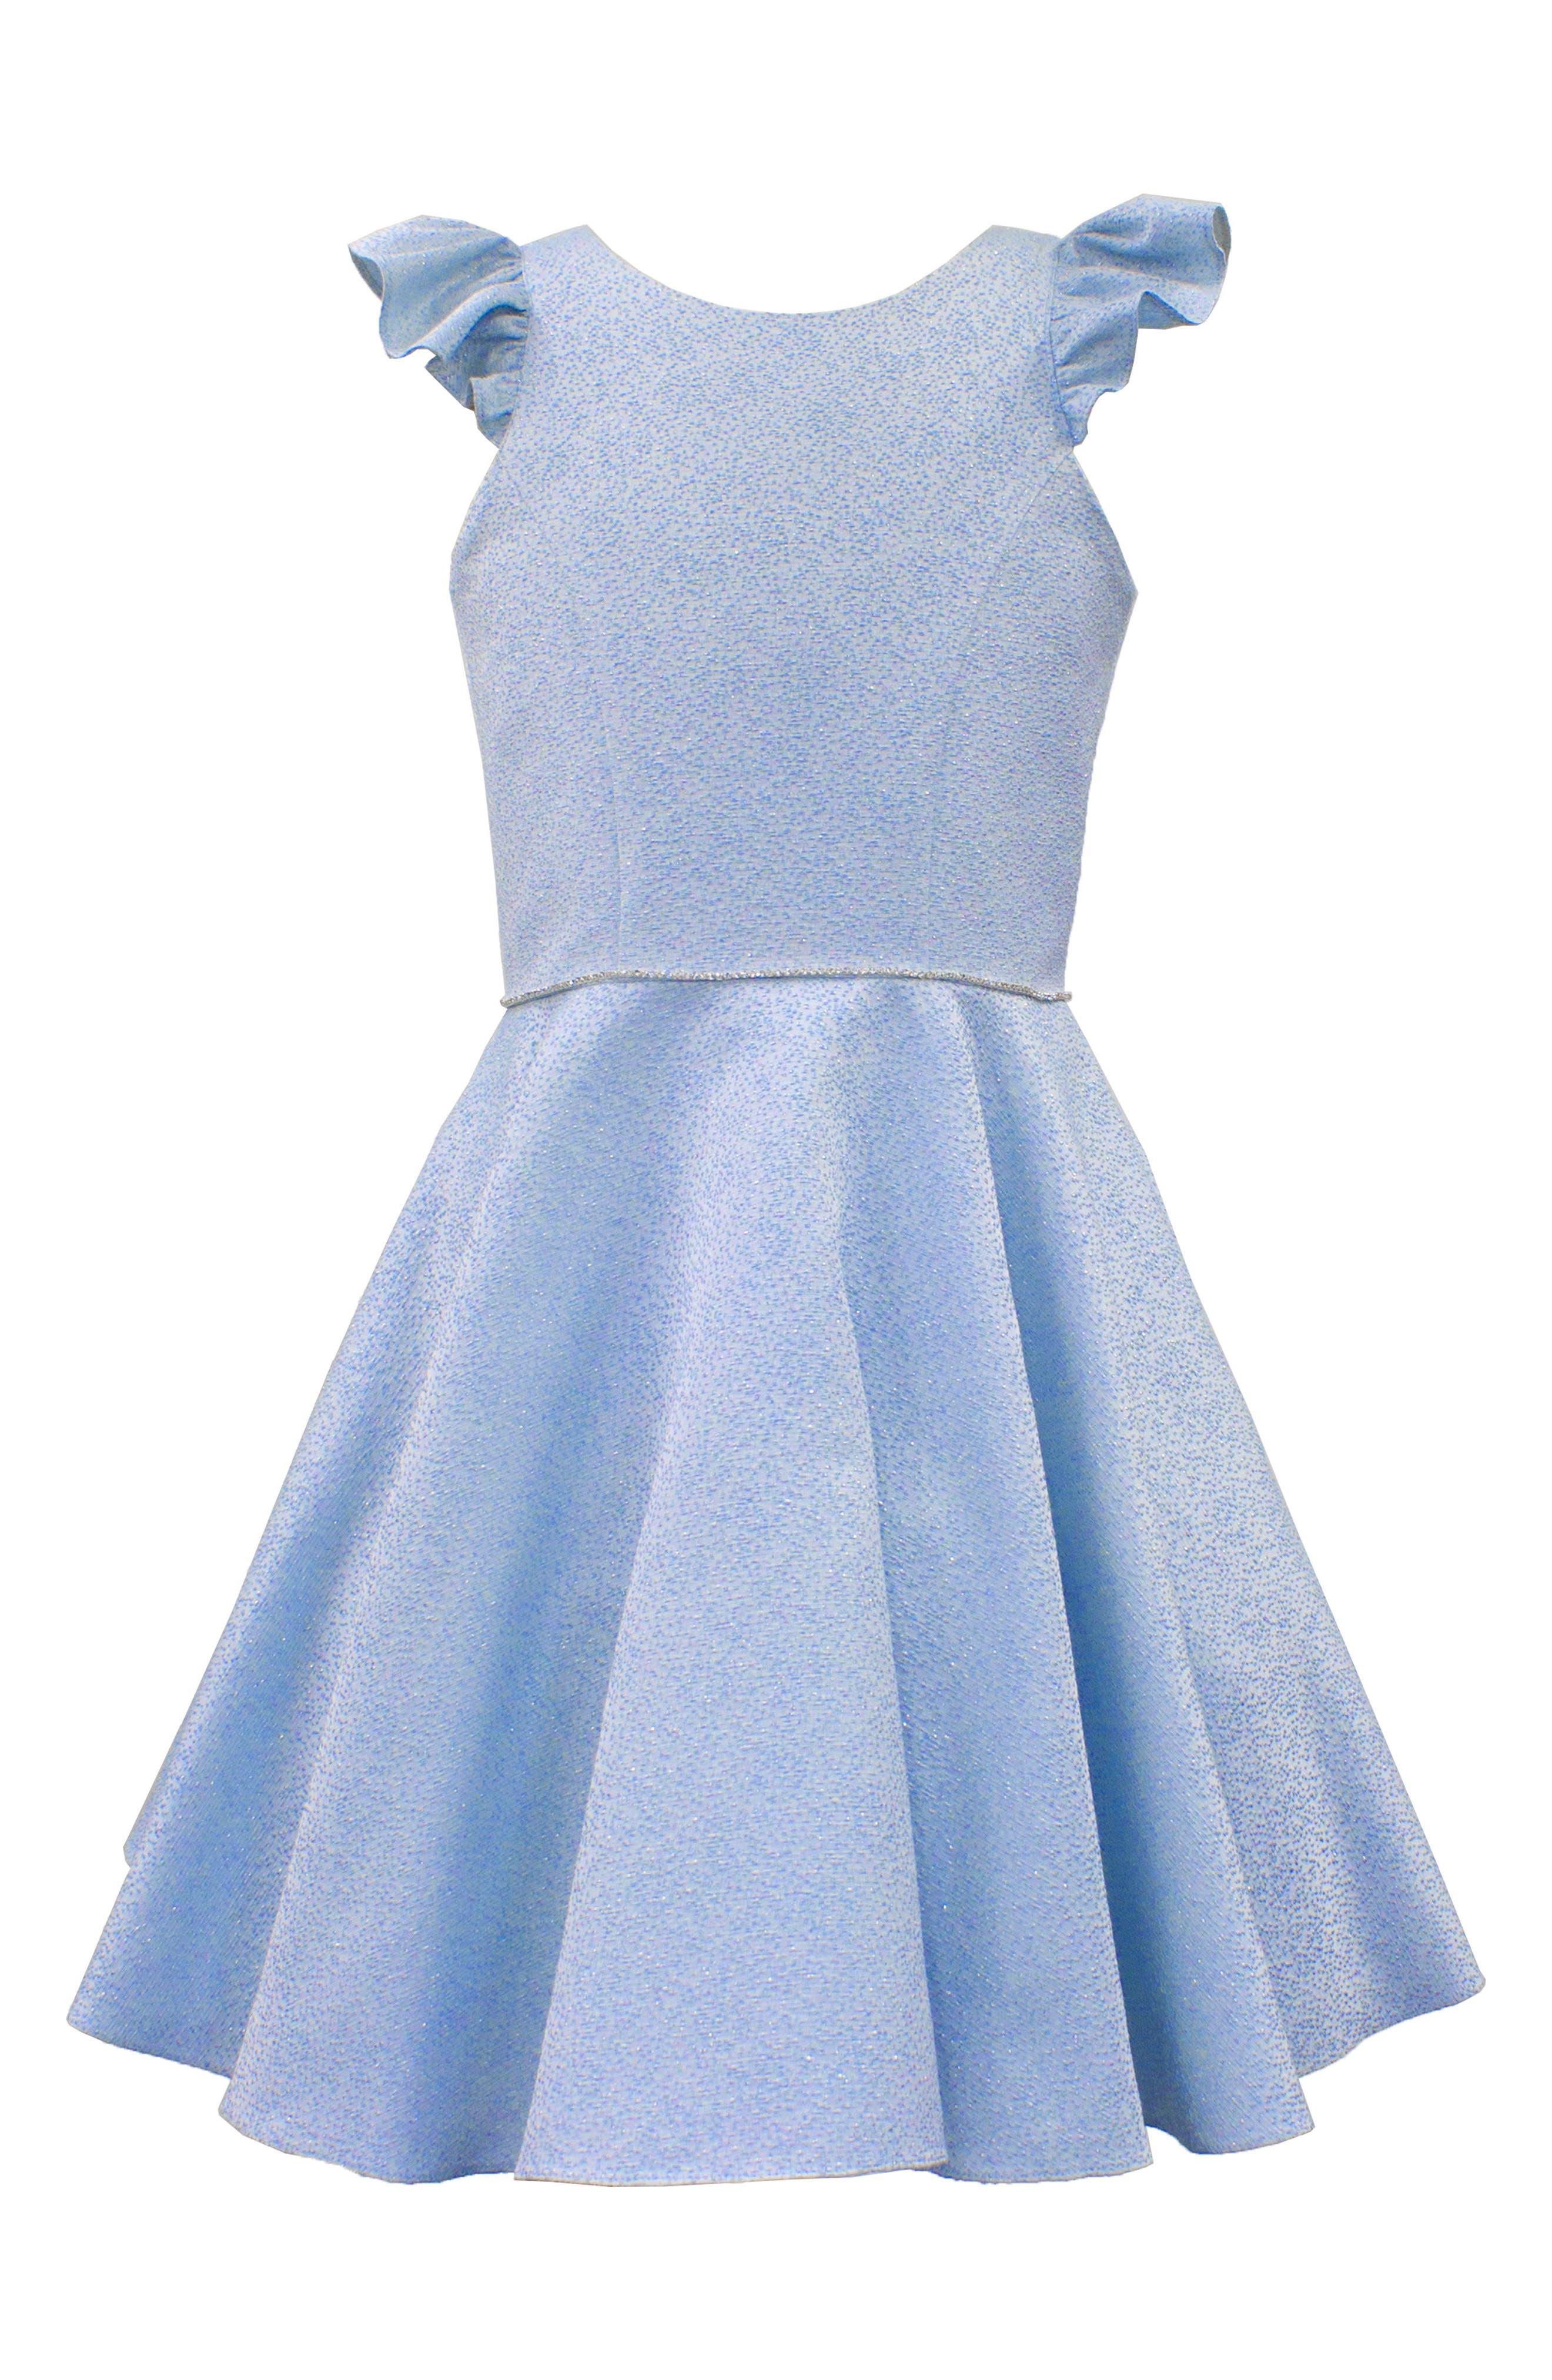 Main Image - David Charles Flutter Sleeve Dress (Big Girls)